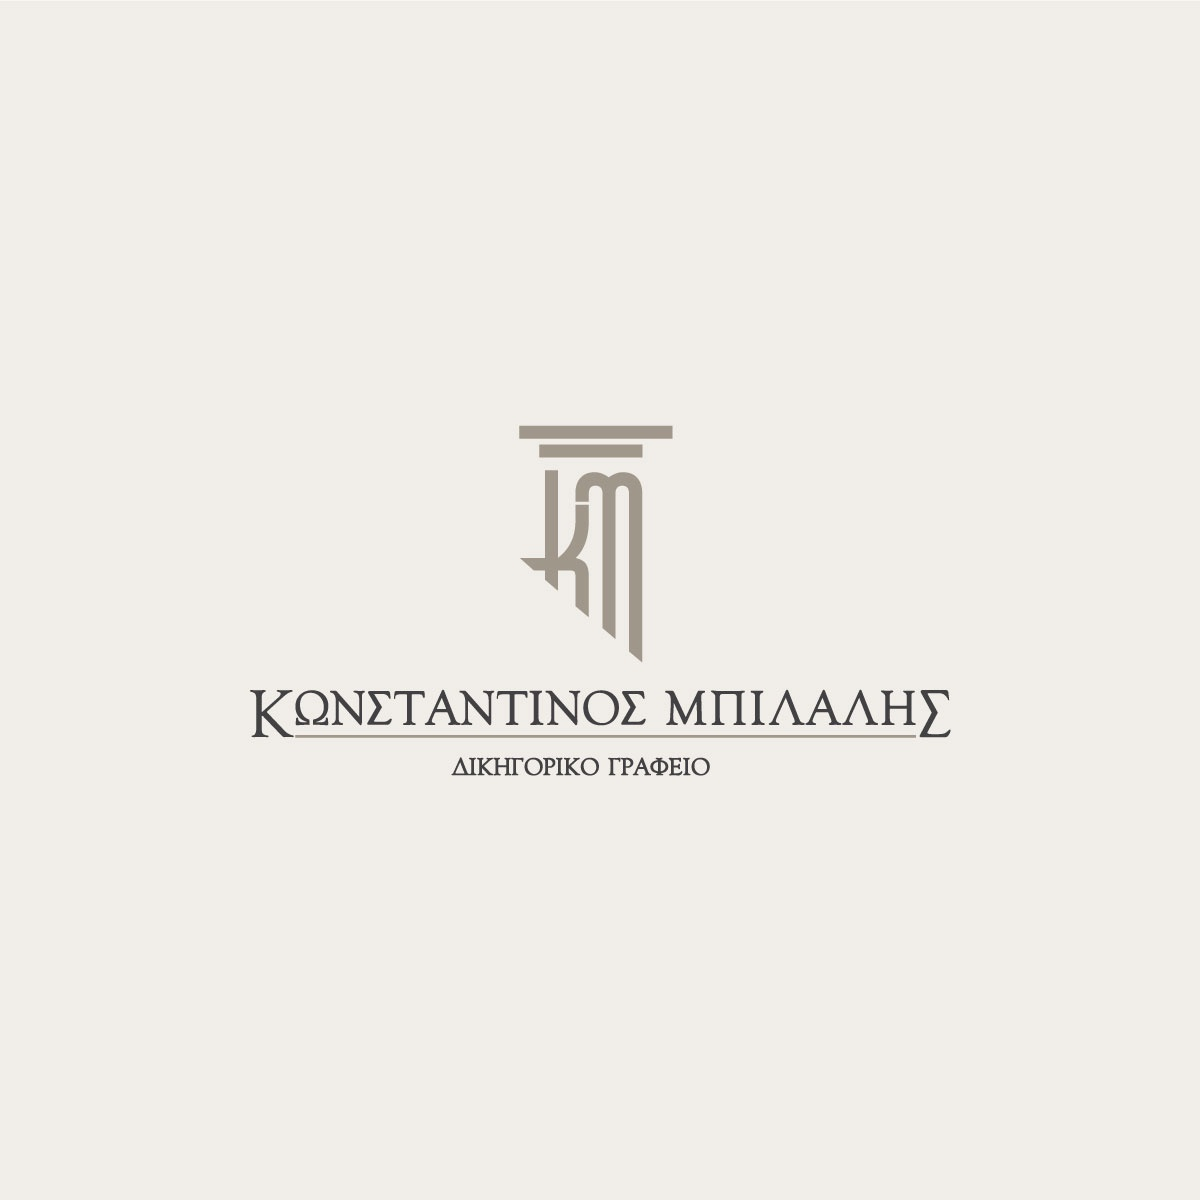 K_Bilalis_Presentation_FINAL1